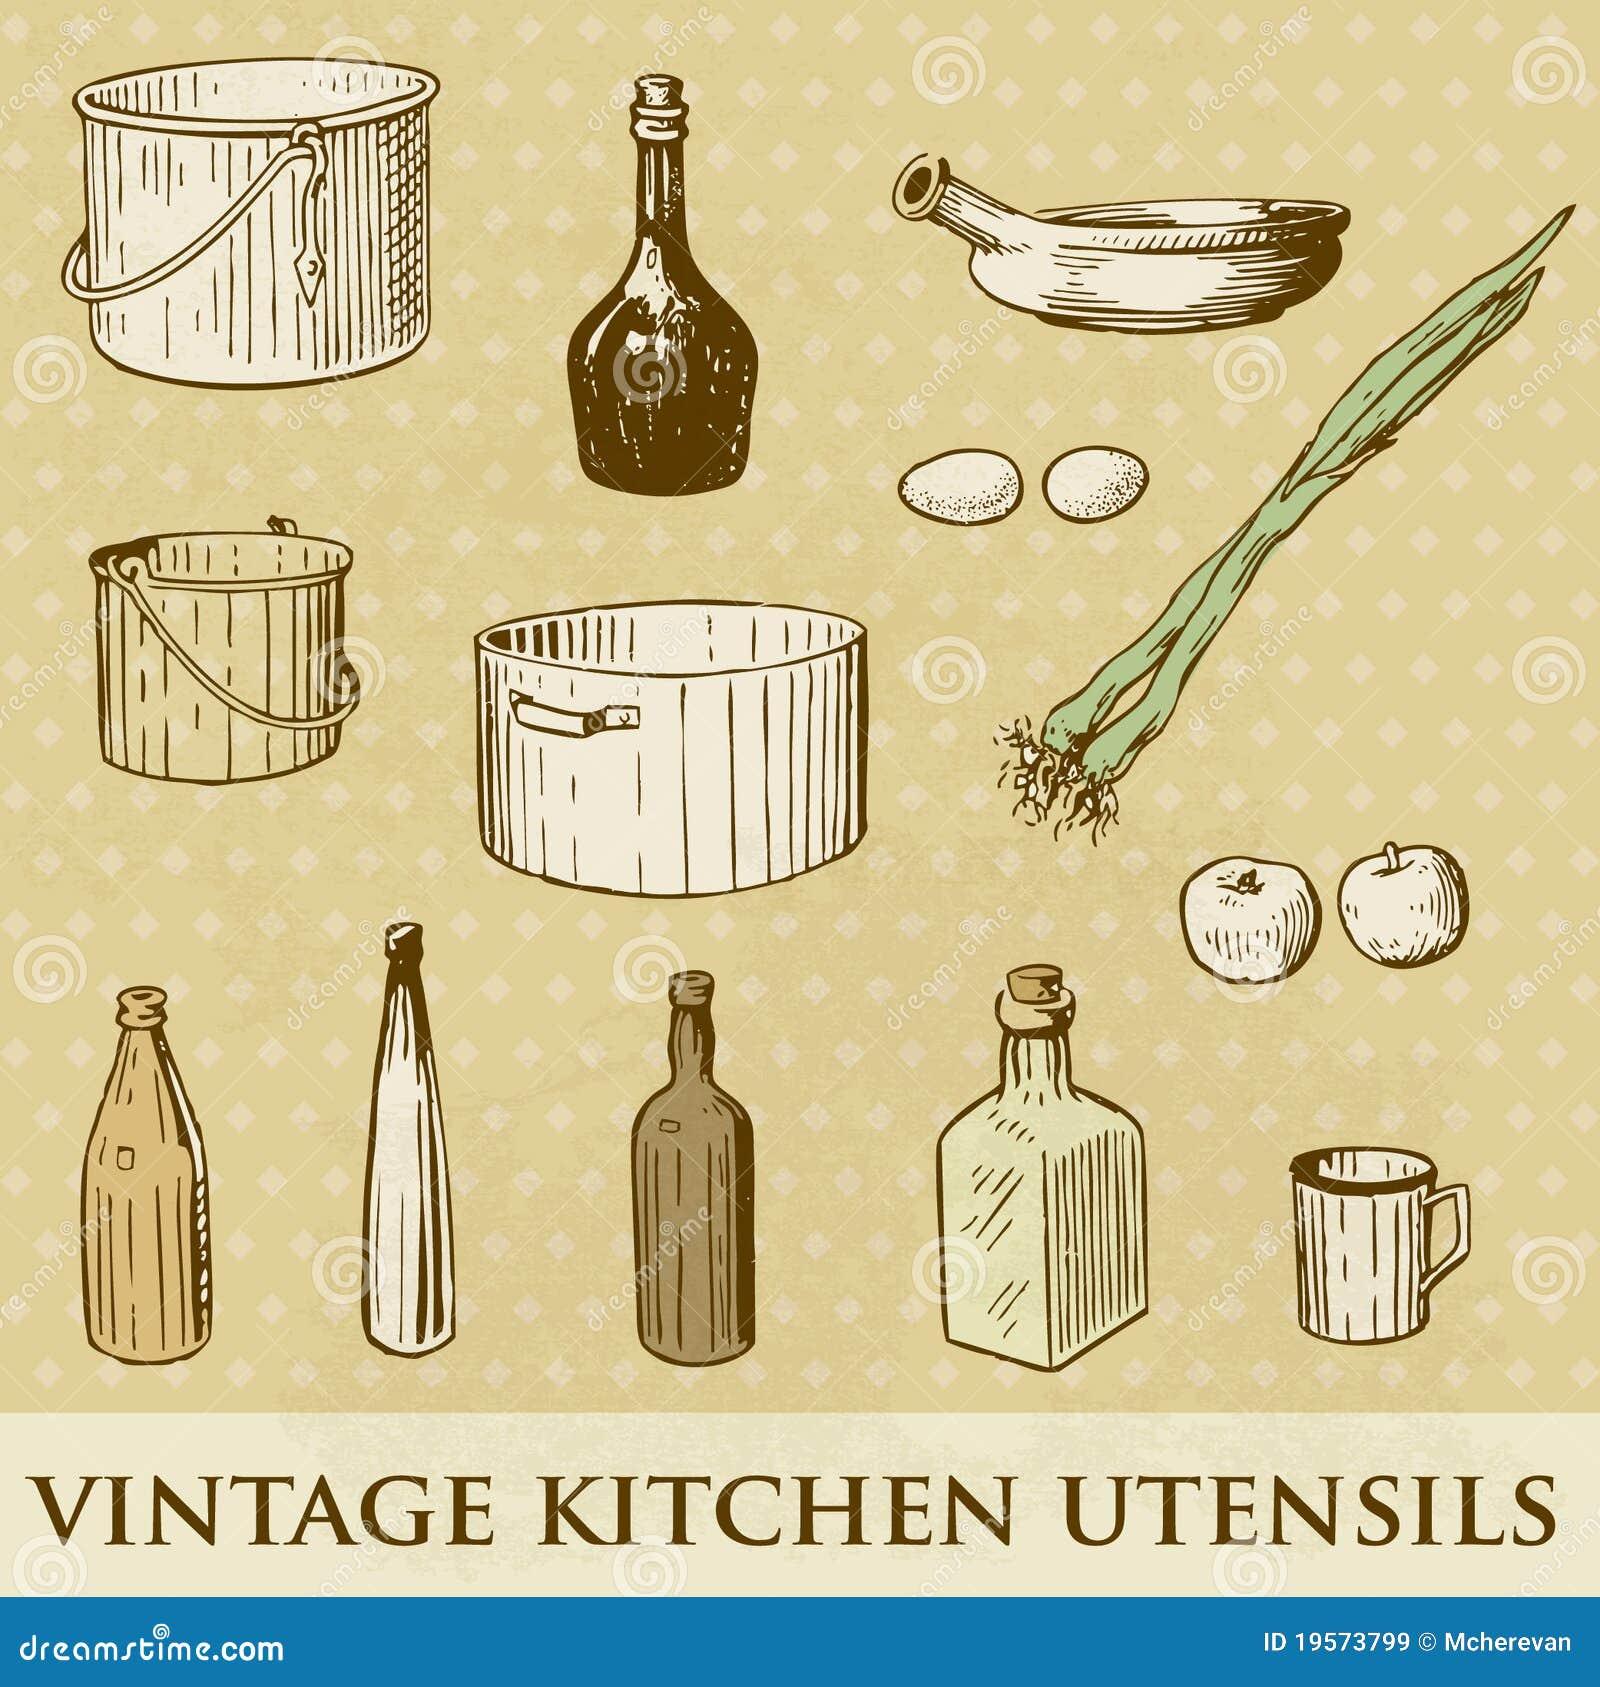 Dream Kitchen Utensils: Set Of Vintage Kitchen Utensils Royalty Free Stock Images